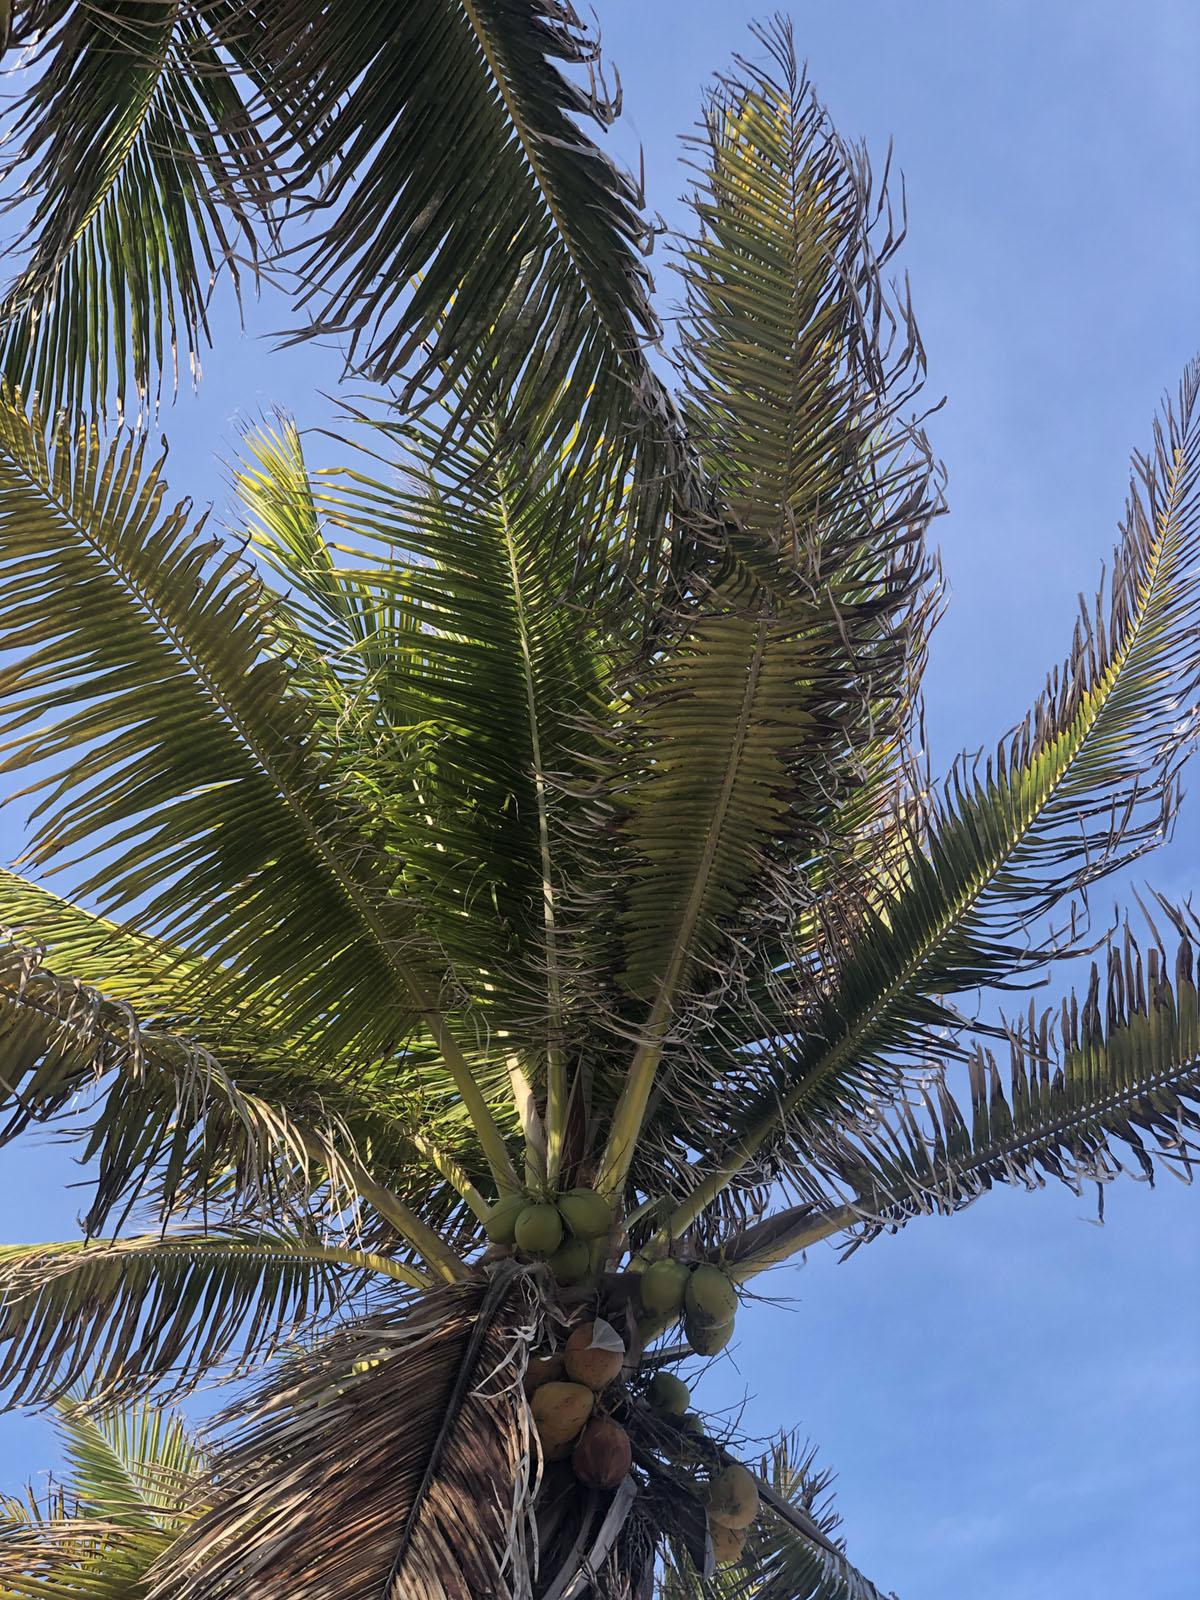 photograph of a palm tree